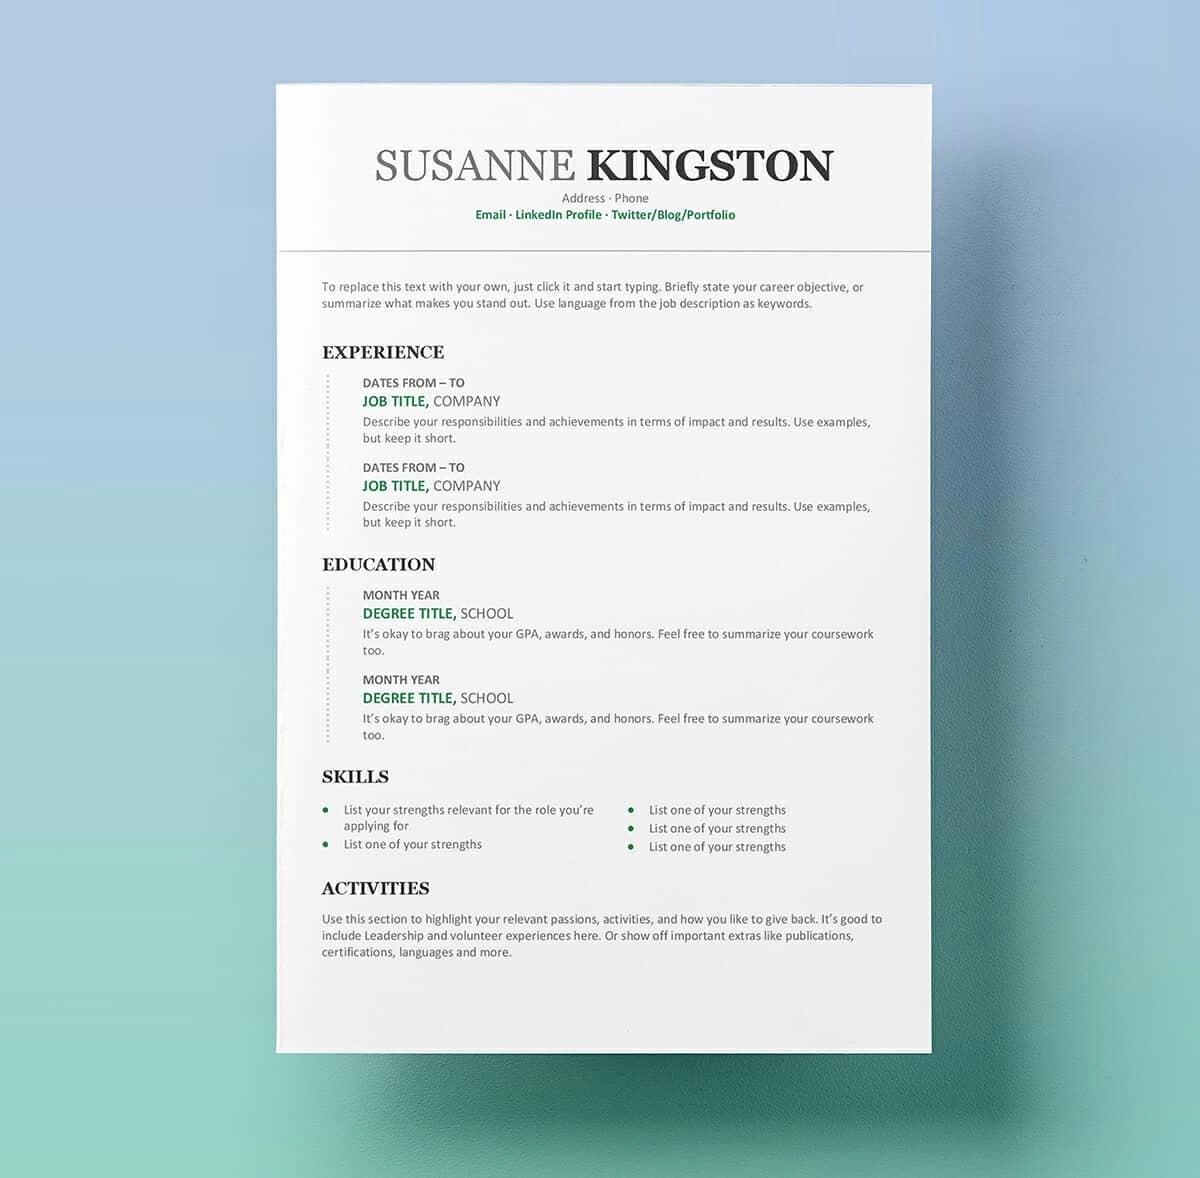 Download Ms Word Resume Template Fresh Resume Templates for Word Free 15 Examples for Download